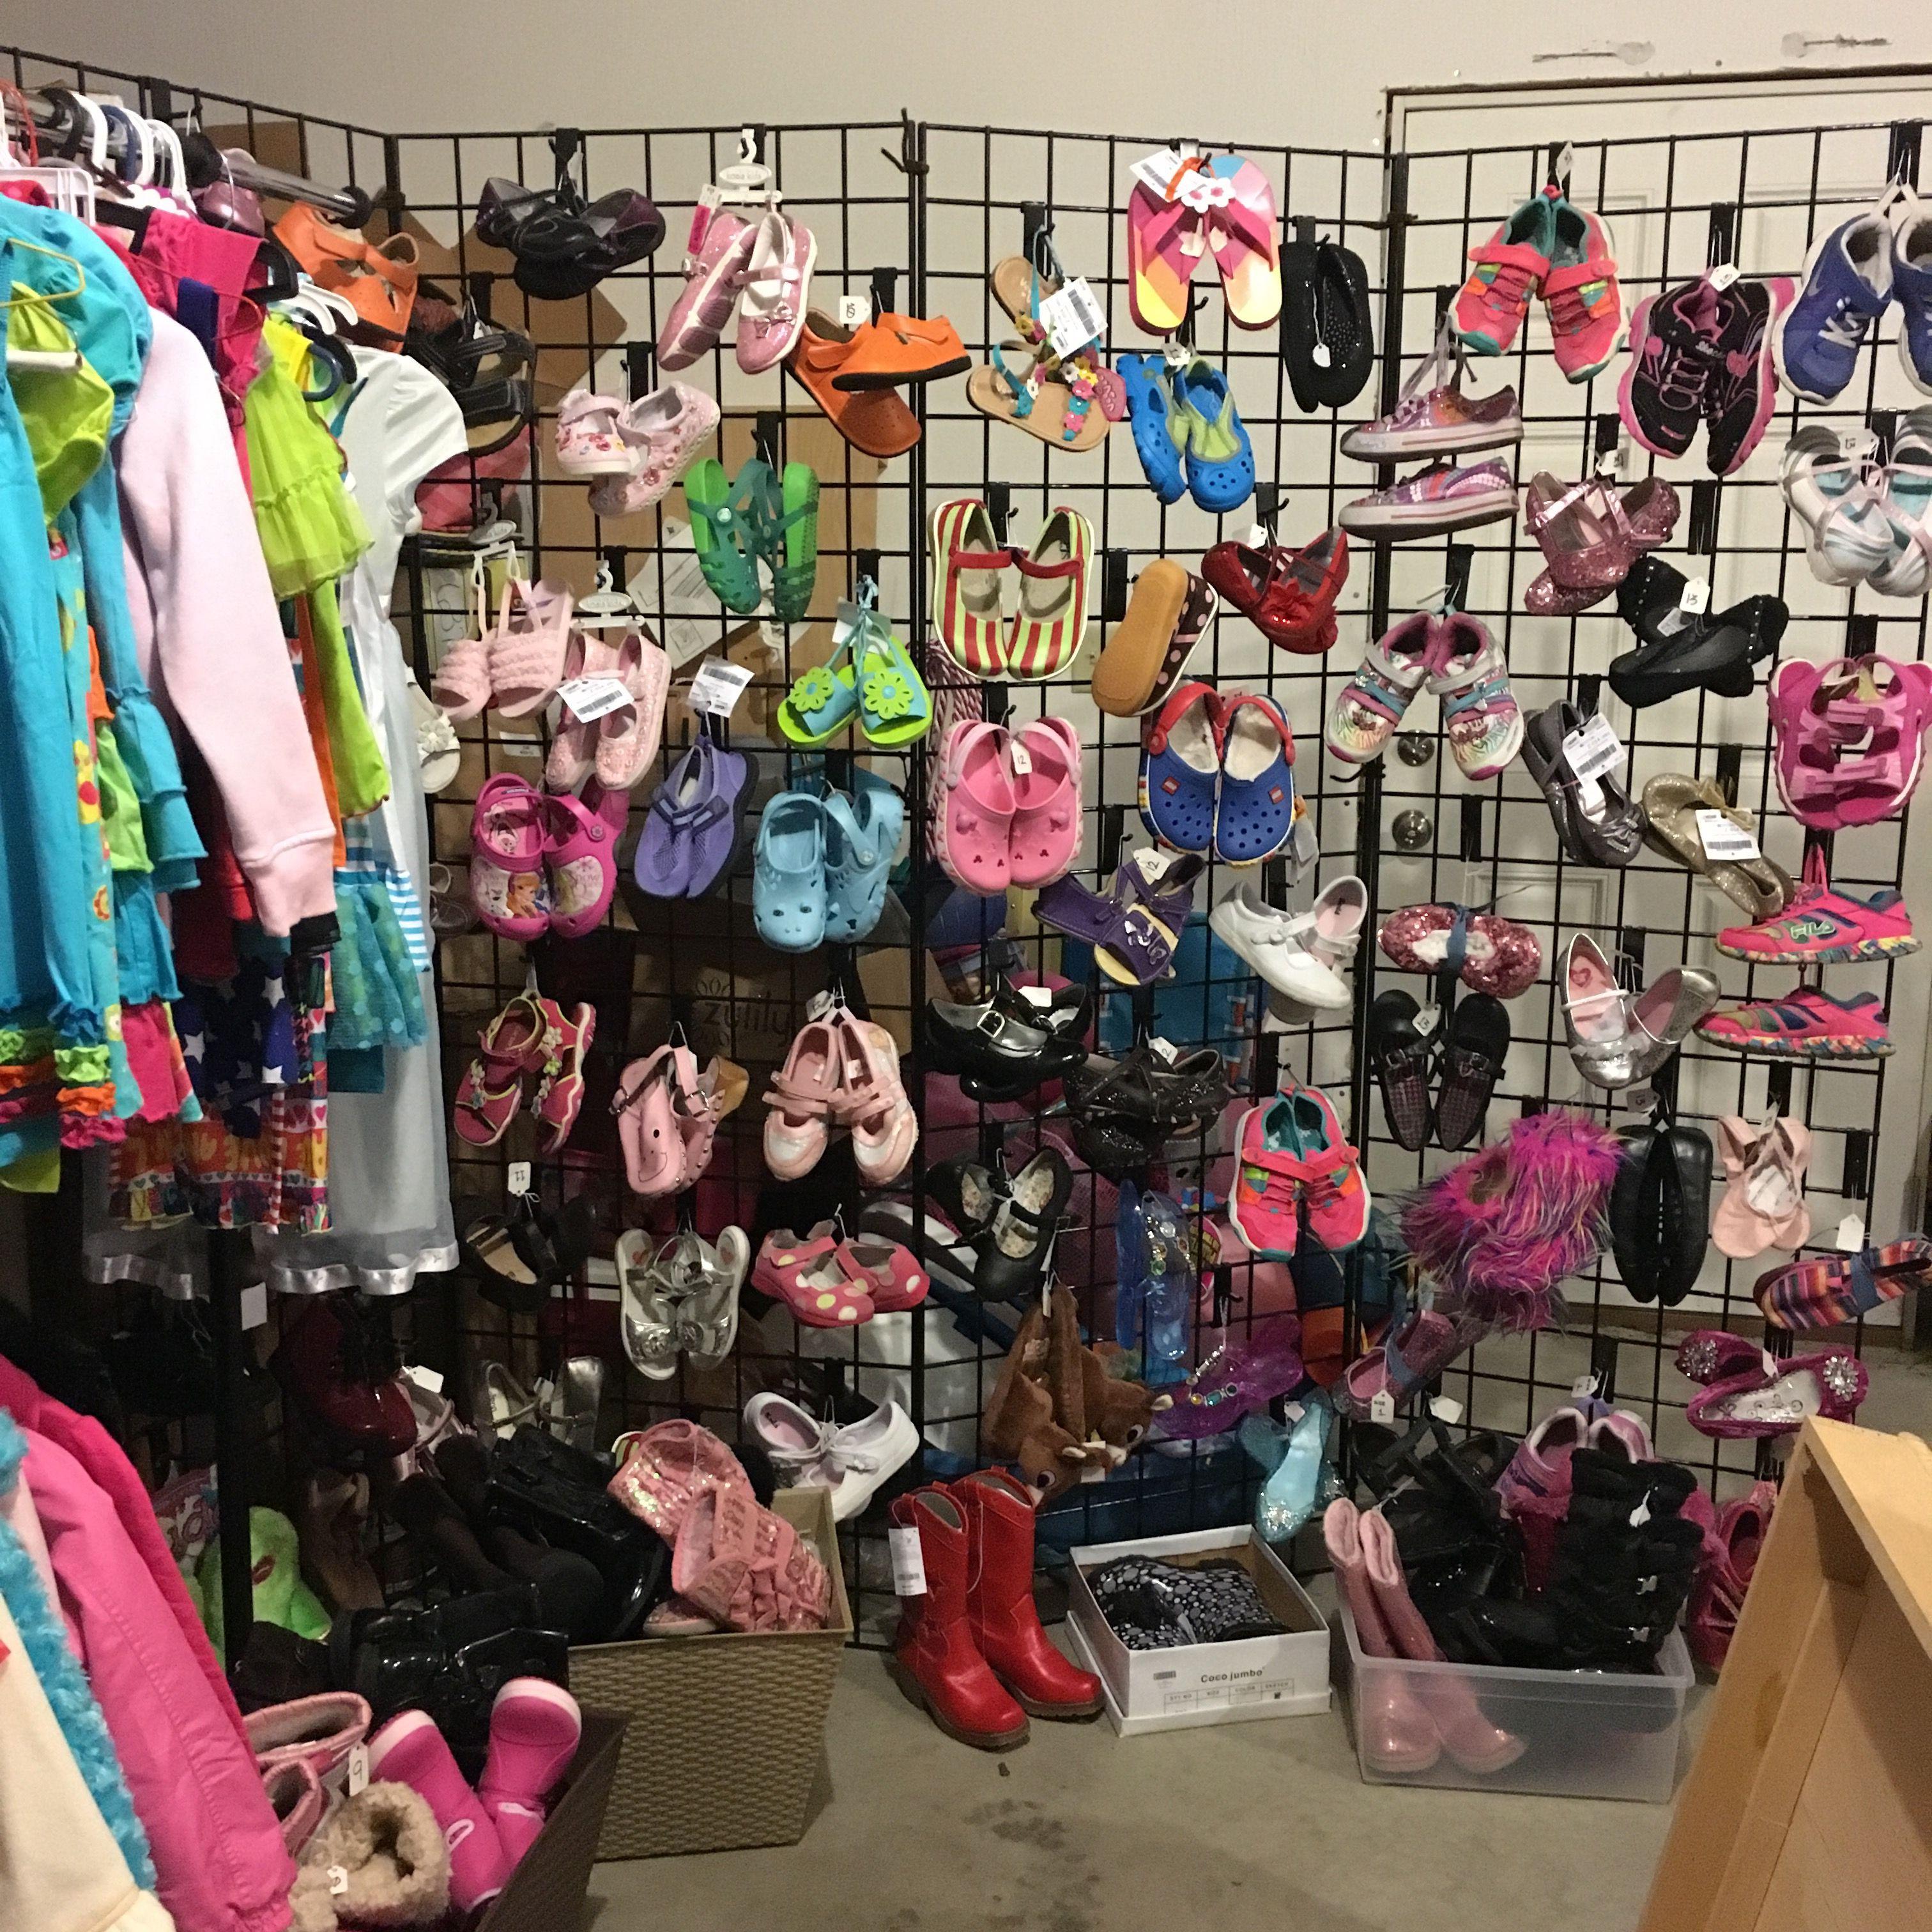 Shoe Display I Set Up At A Friend S Garage Sale Garage Sale Tips Garage Sales Shoe Display